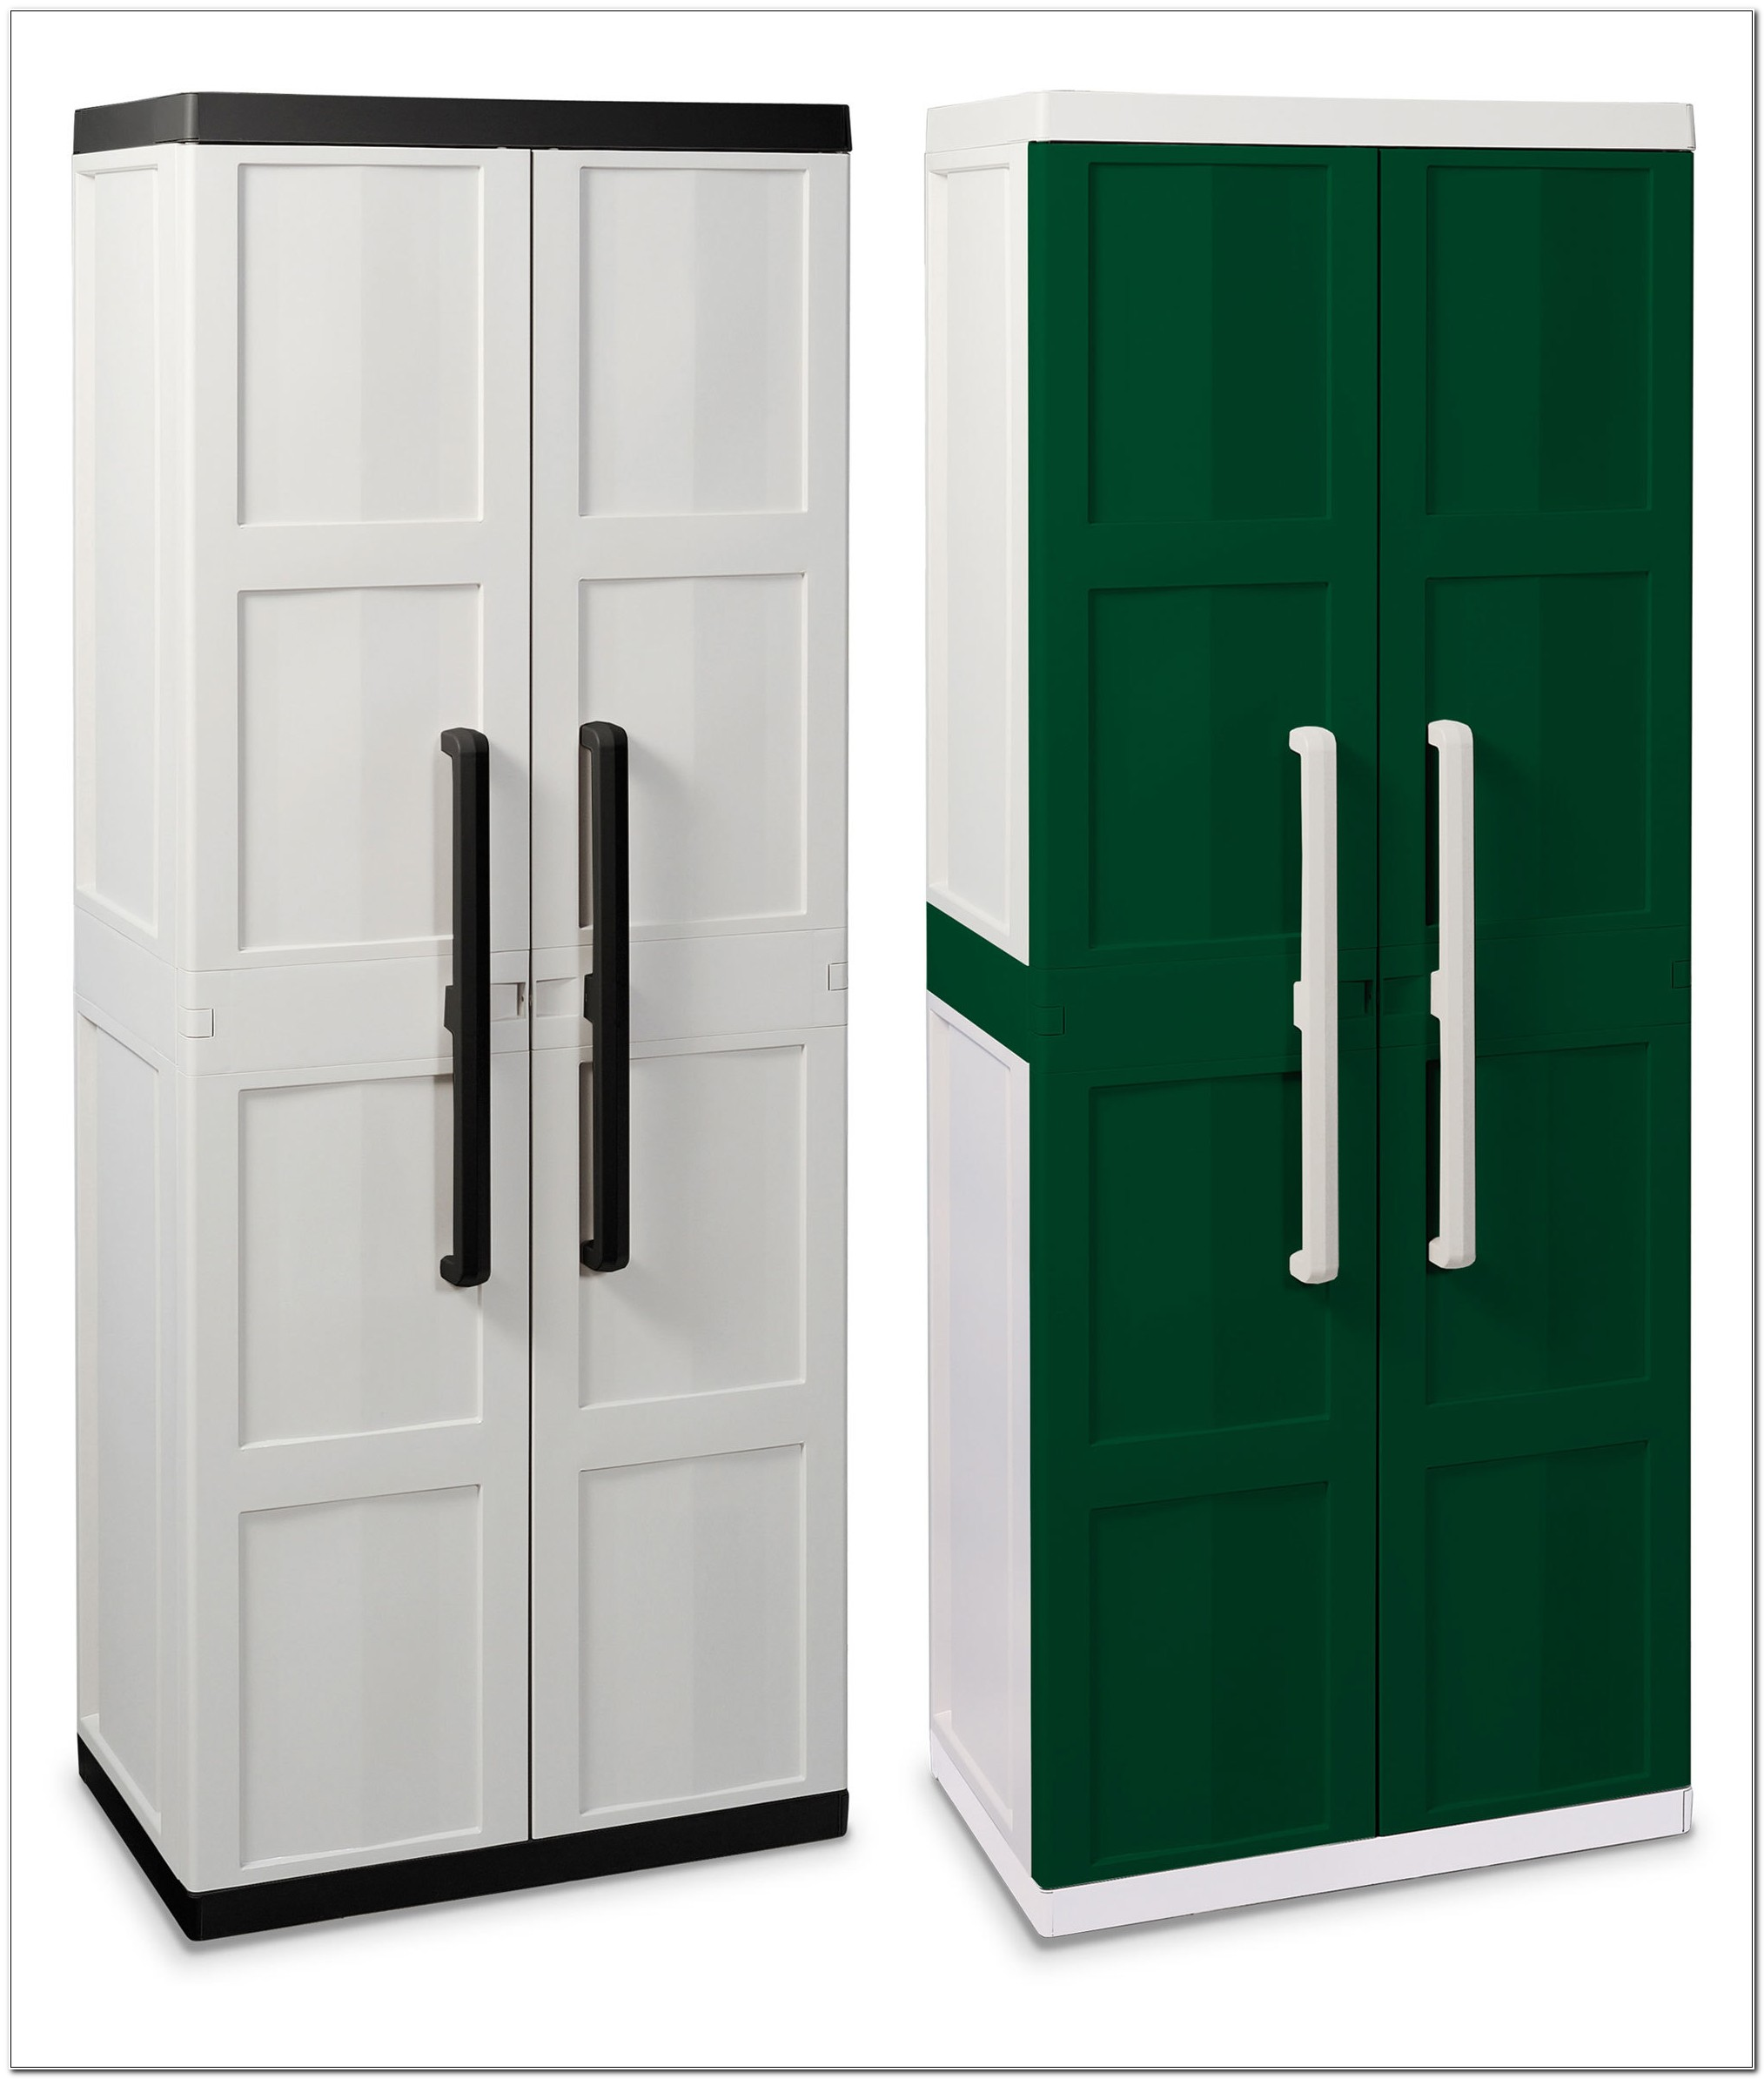 Outdoor Plastic Storage Cabinets With Doors